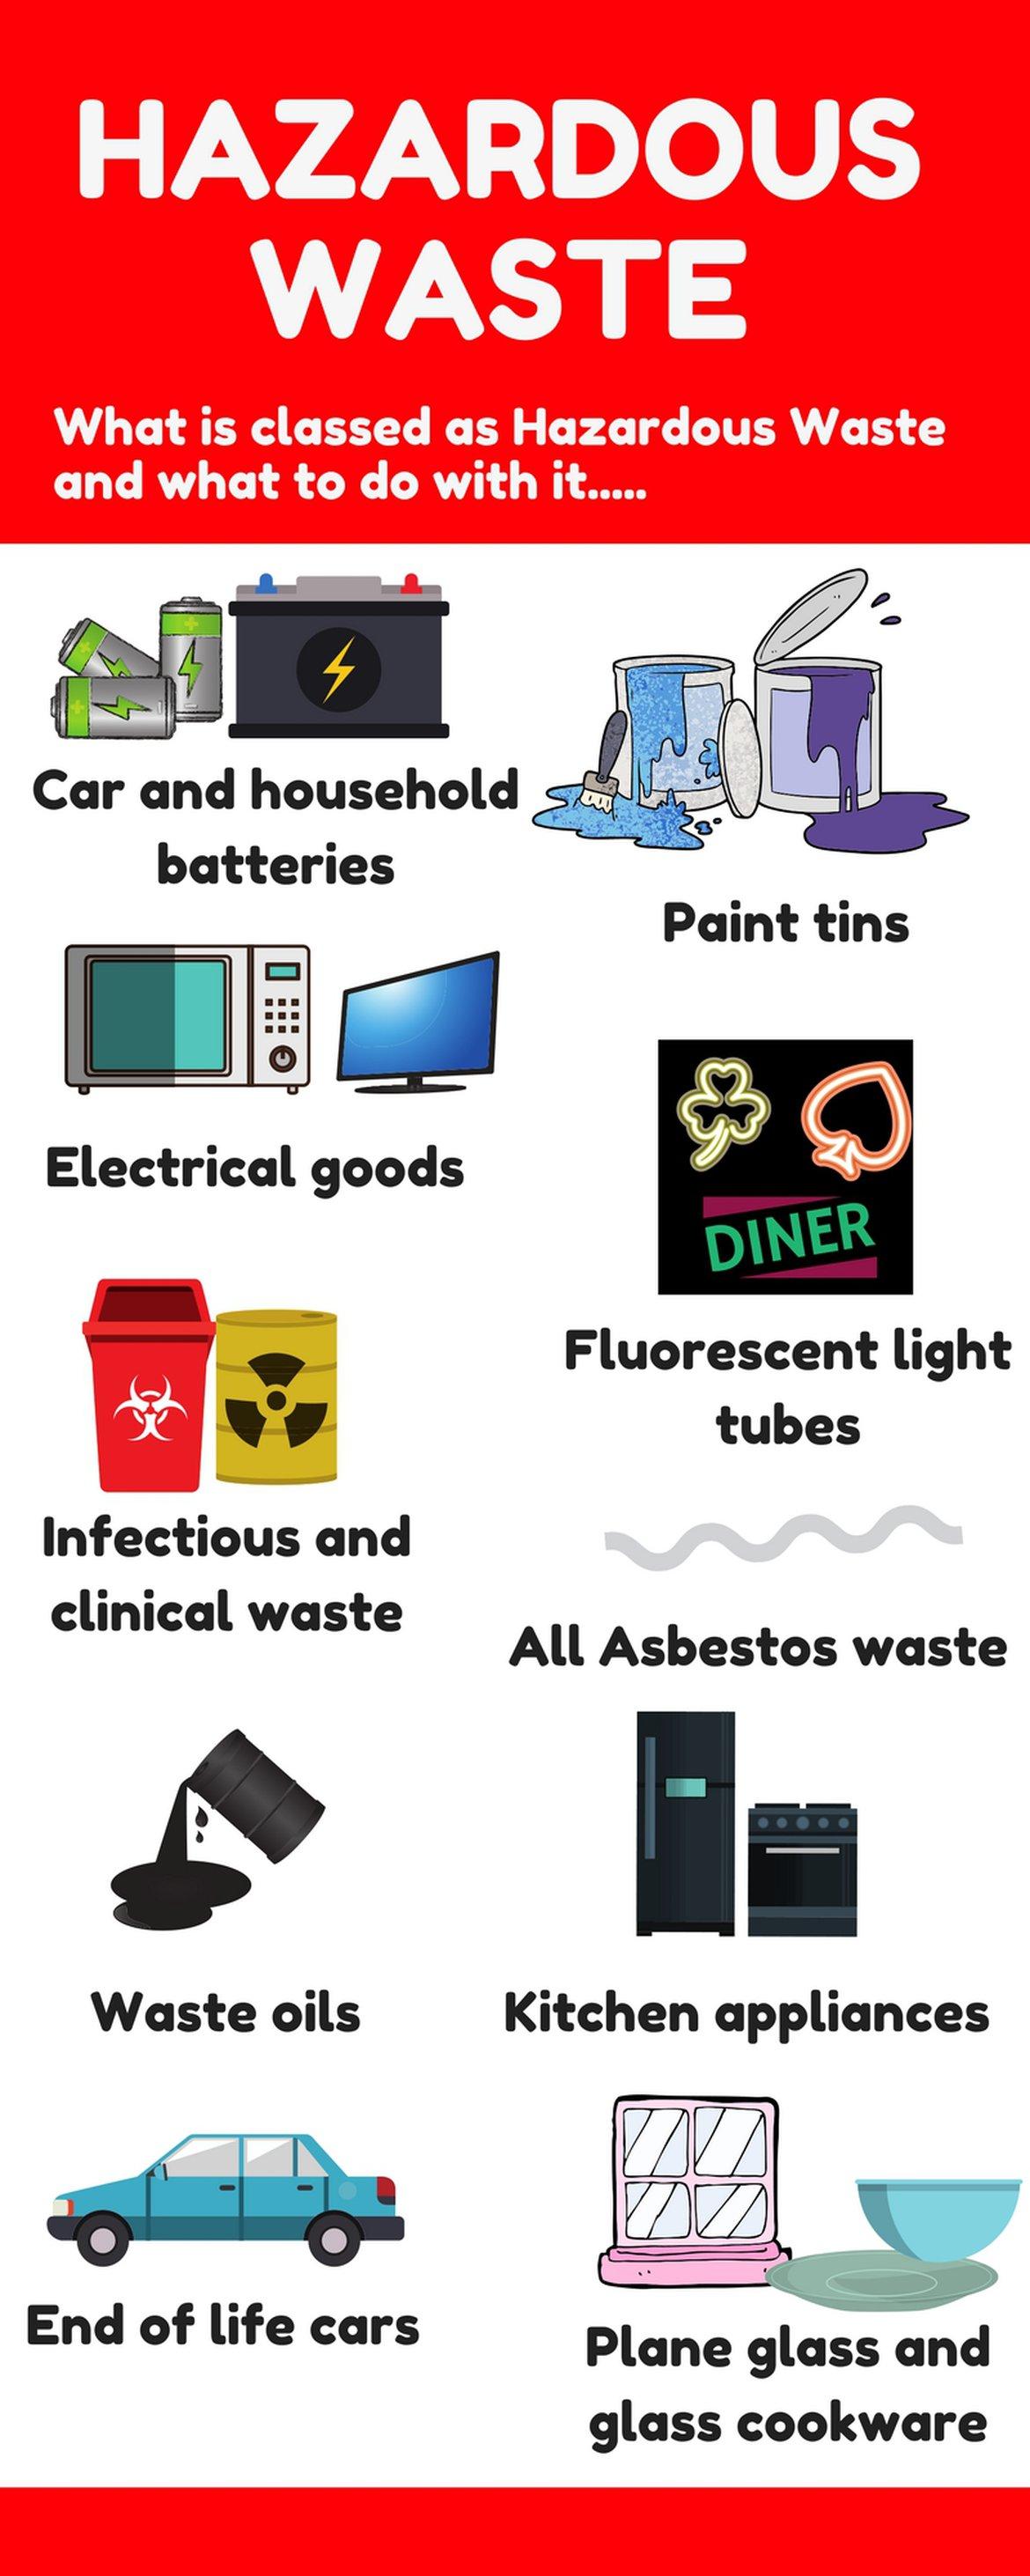 Hazardous waste infographic